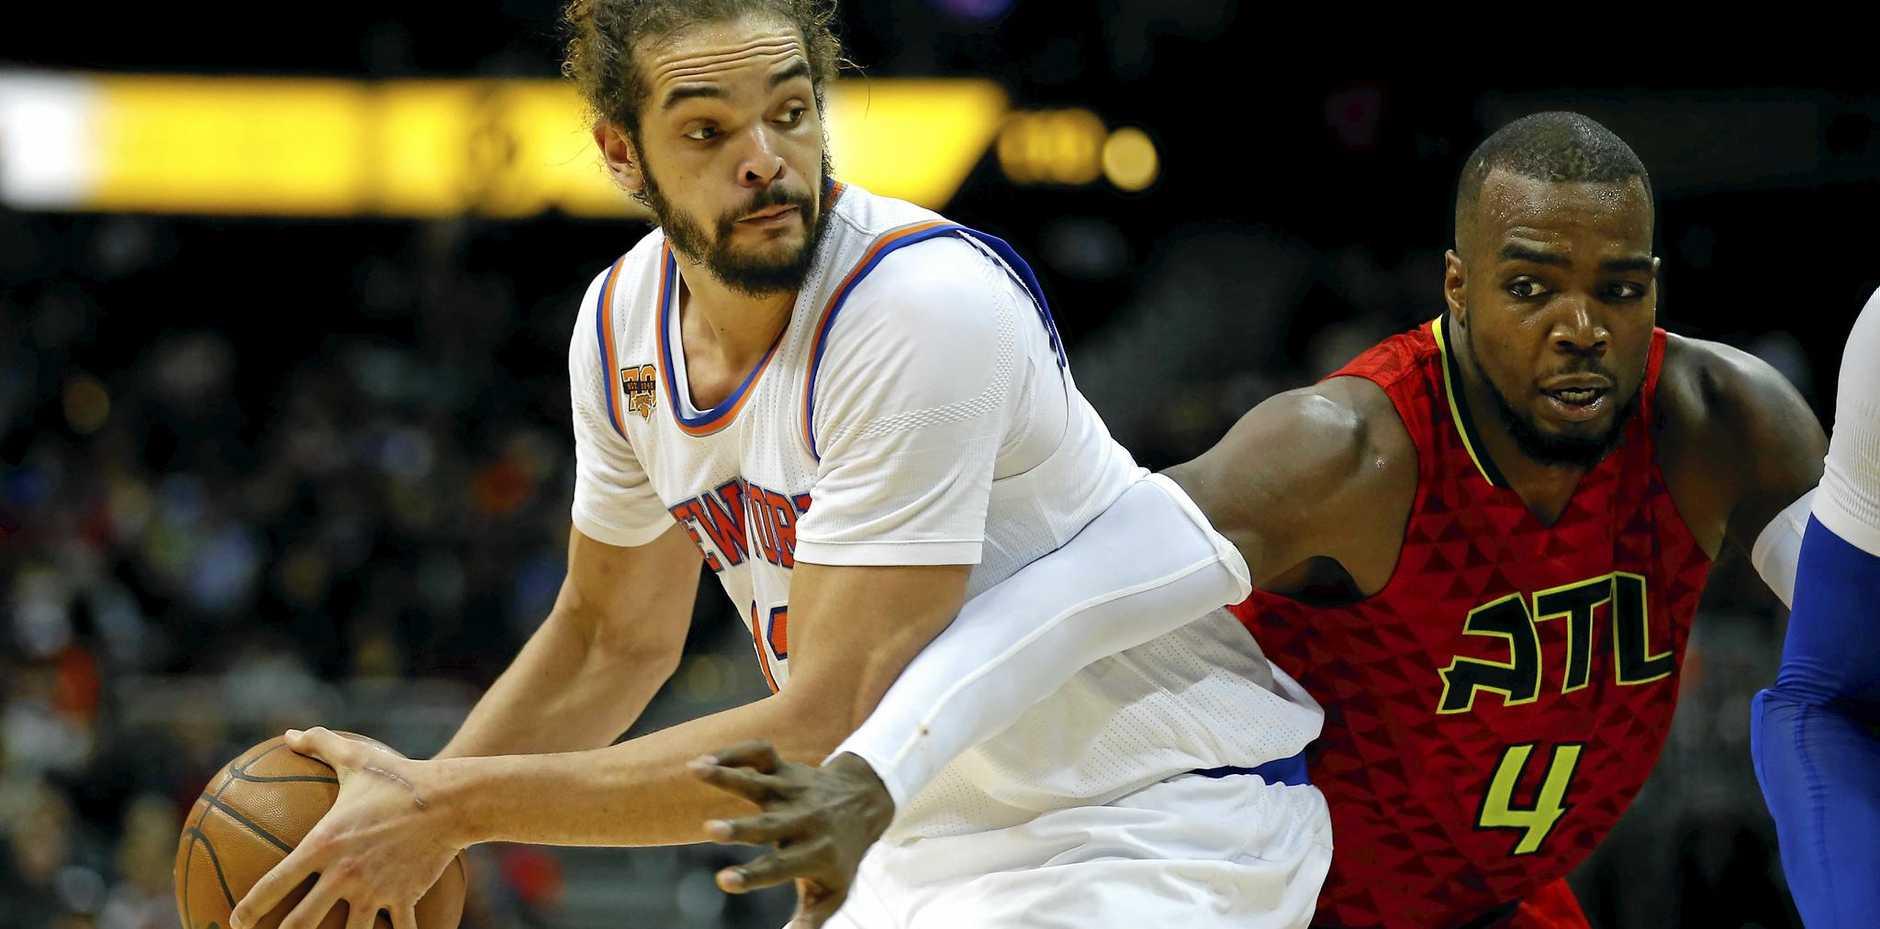 Joakim Noah has been suspended for 20 NBA games.